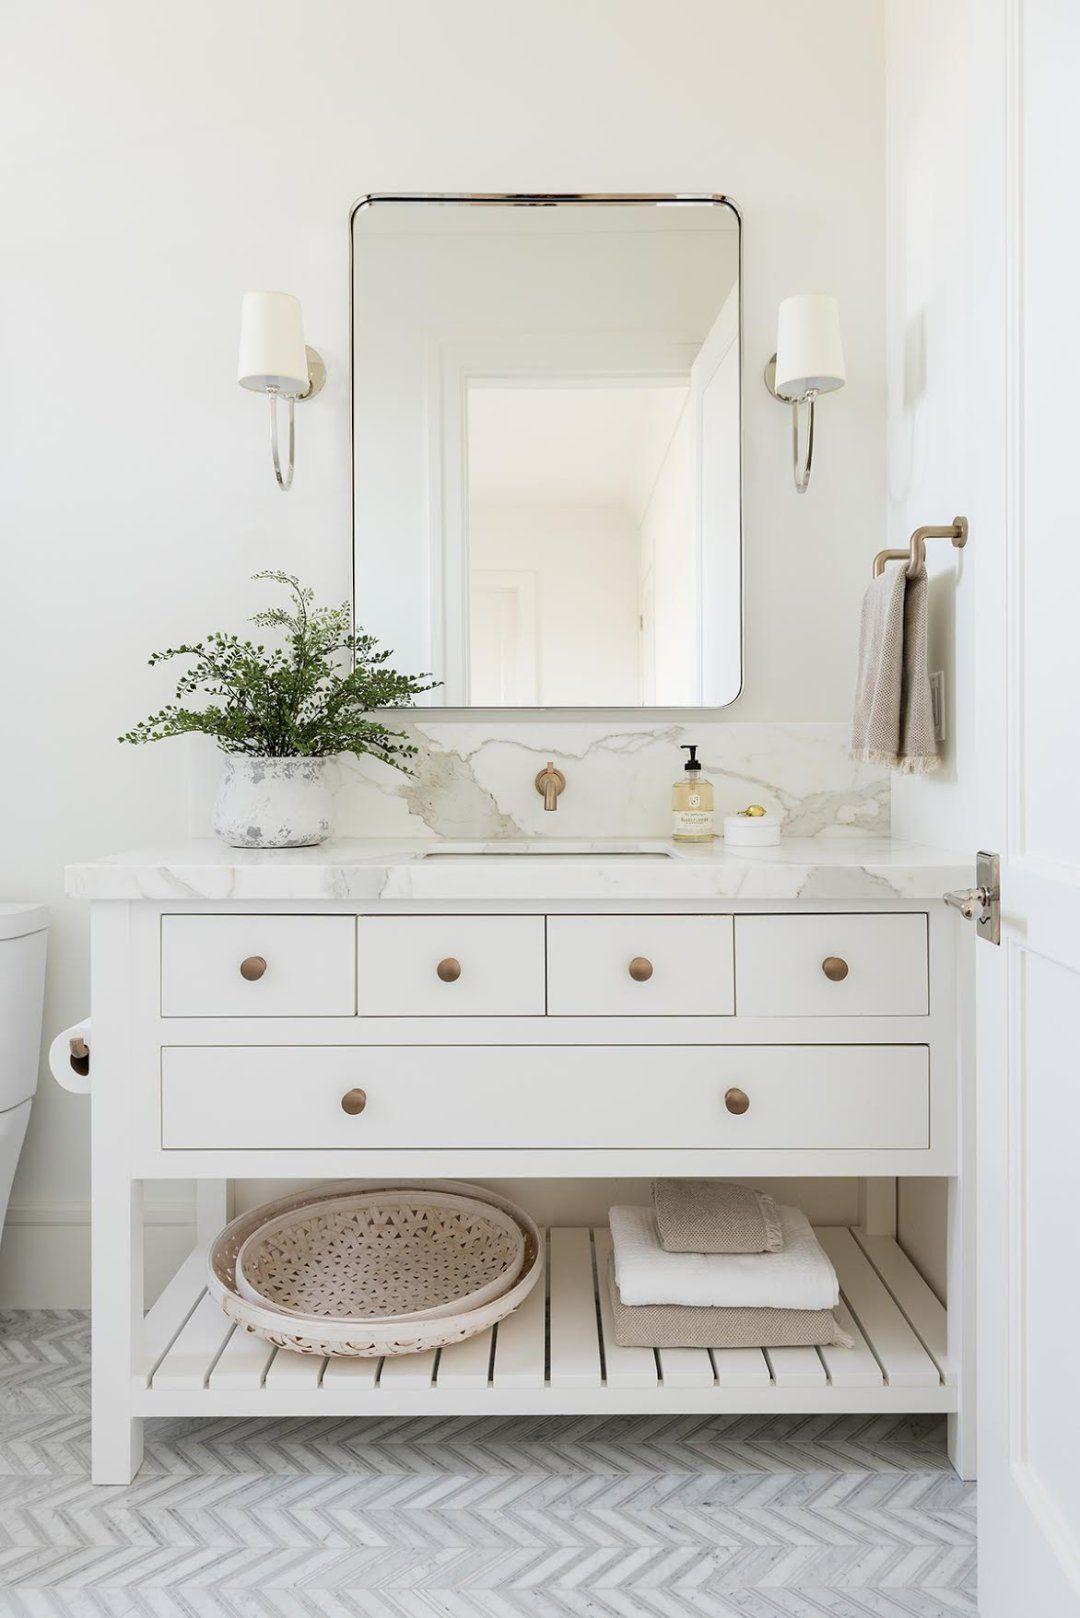 California Traditional Home Tour Bathroom Interior Bathrooms